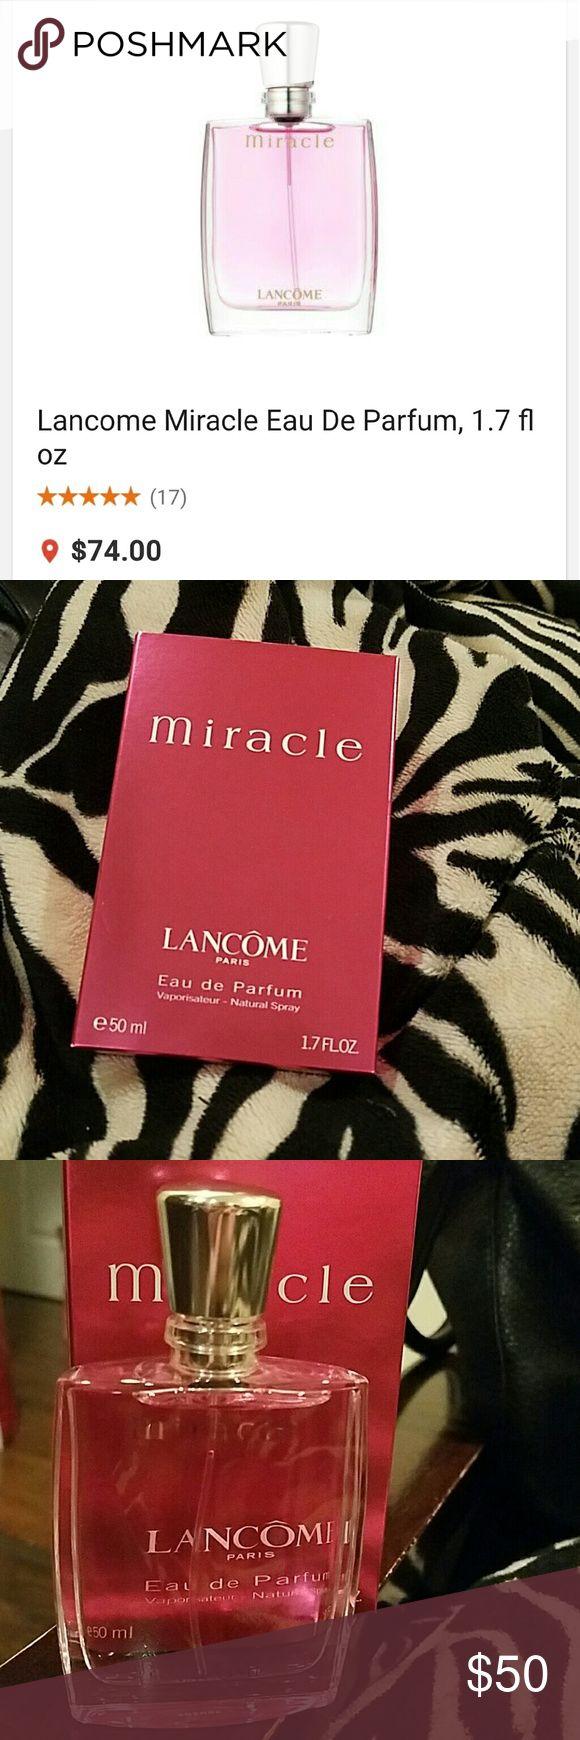 Lancome Miracle Eau De Parfum, 1.7 fl oz BNIB Lancome Miracle Lancome Makeup